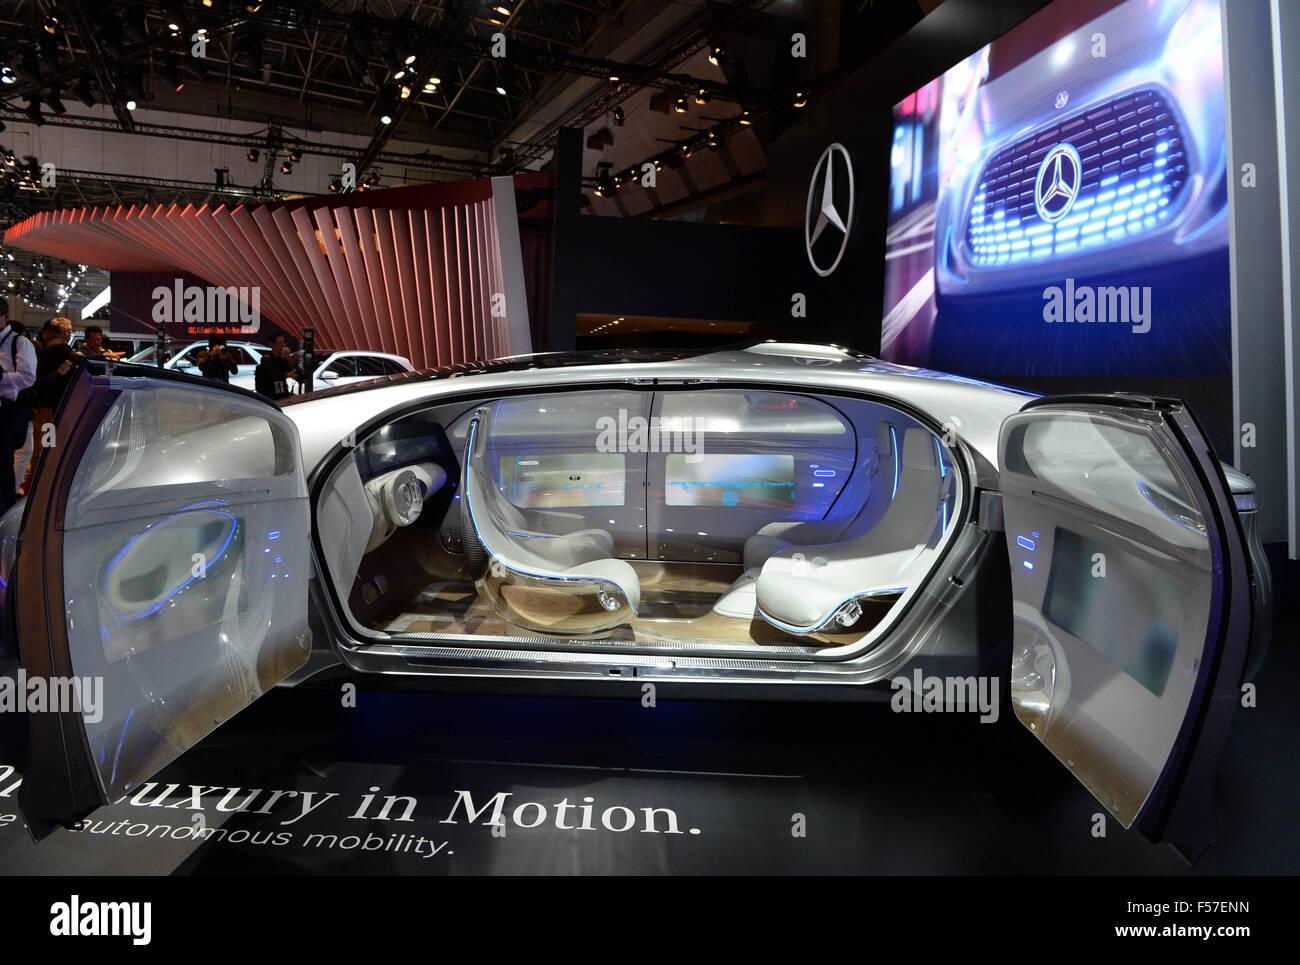 https://c8.alamy.com/comp/F57ENN/tokyo-japan-29th-oct-2015-mercedes-benz-vision-tokyo-concept-car-is-F57ENN.jpg